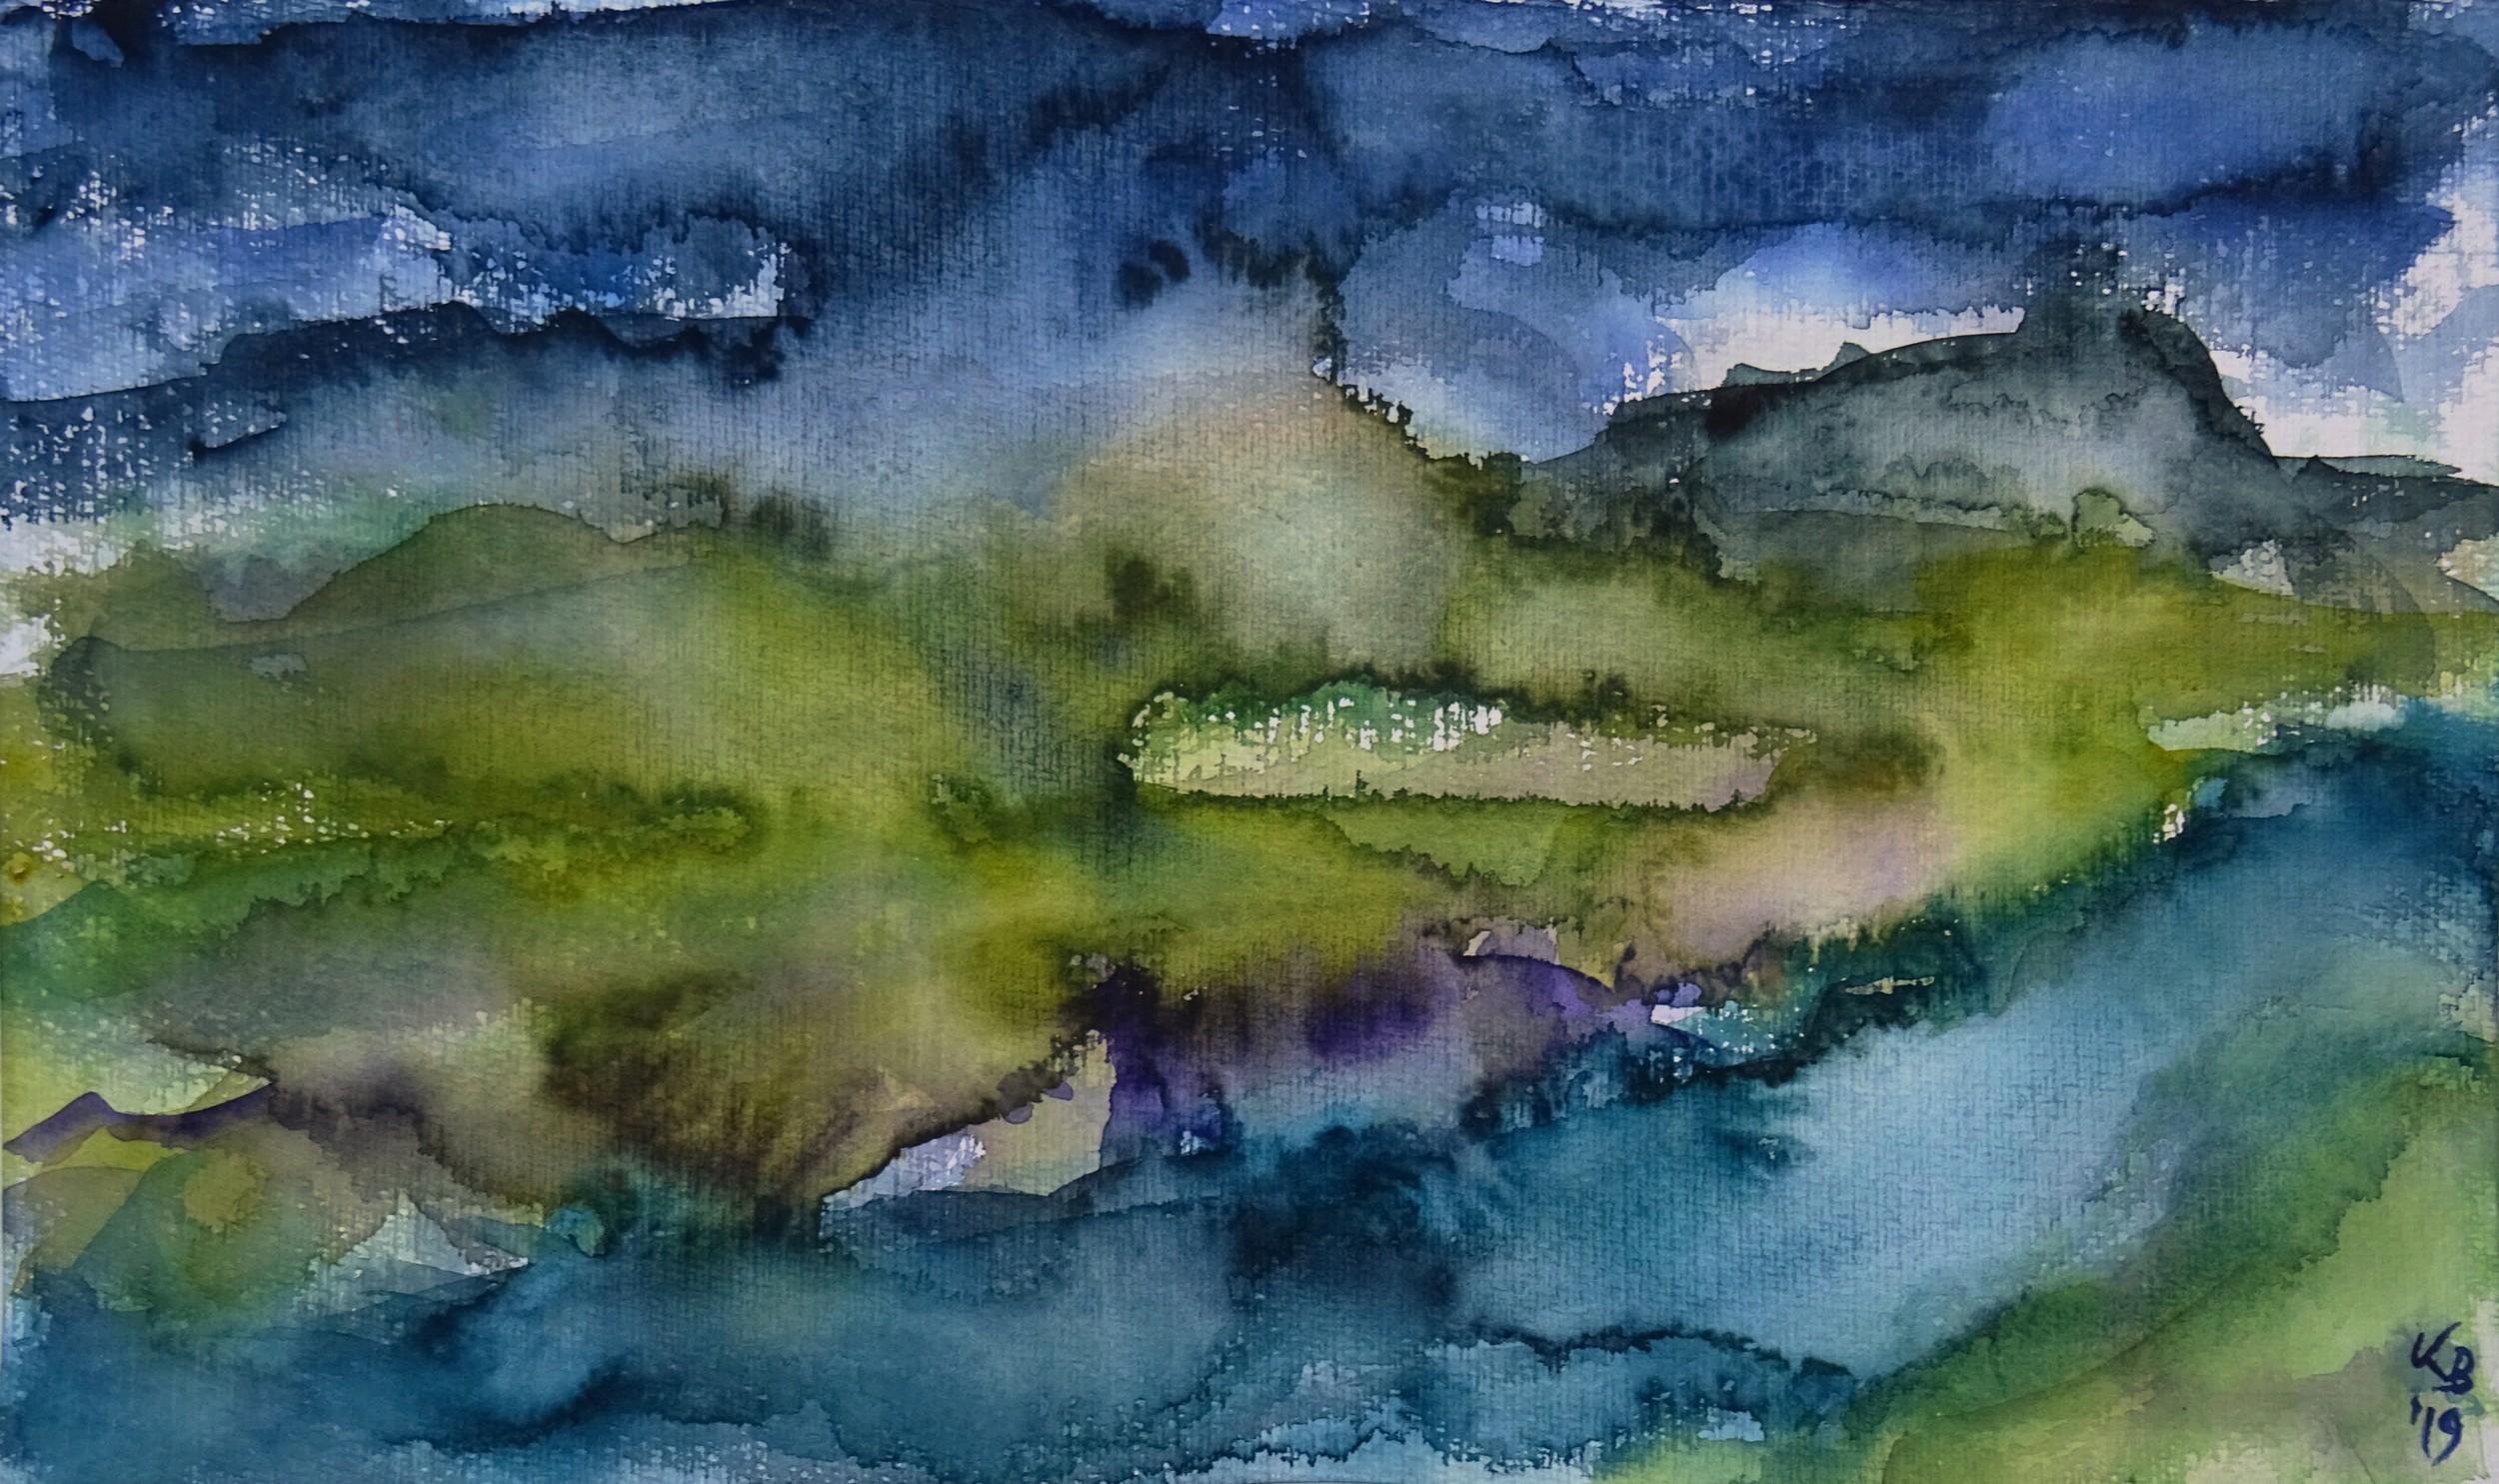 19-01-12_outer_hebrideslewis_abhainn_dearg_Watercolour_50_x_30_cm_©2019_by_Klaus_Bölling.jpg